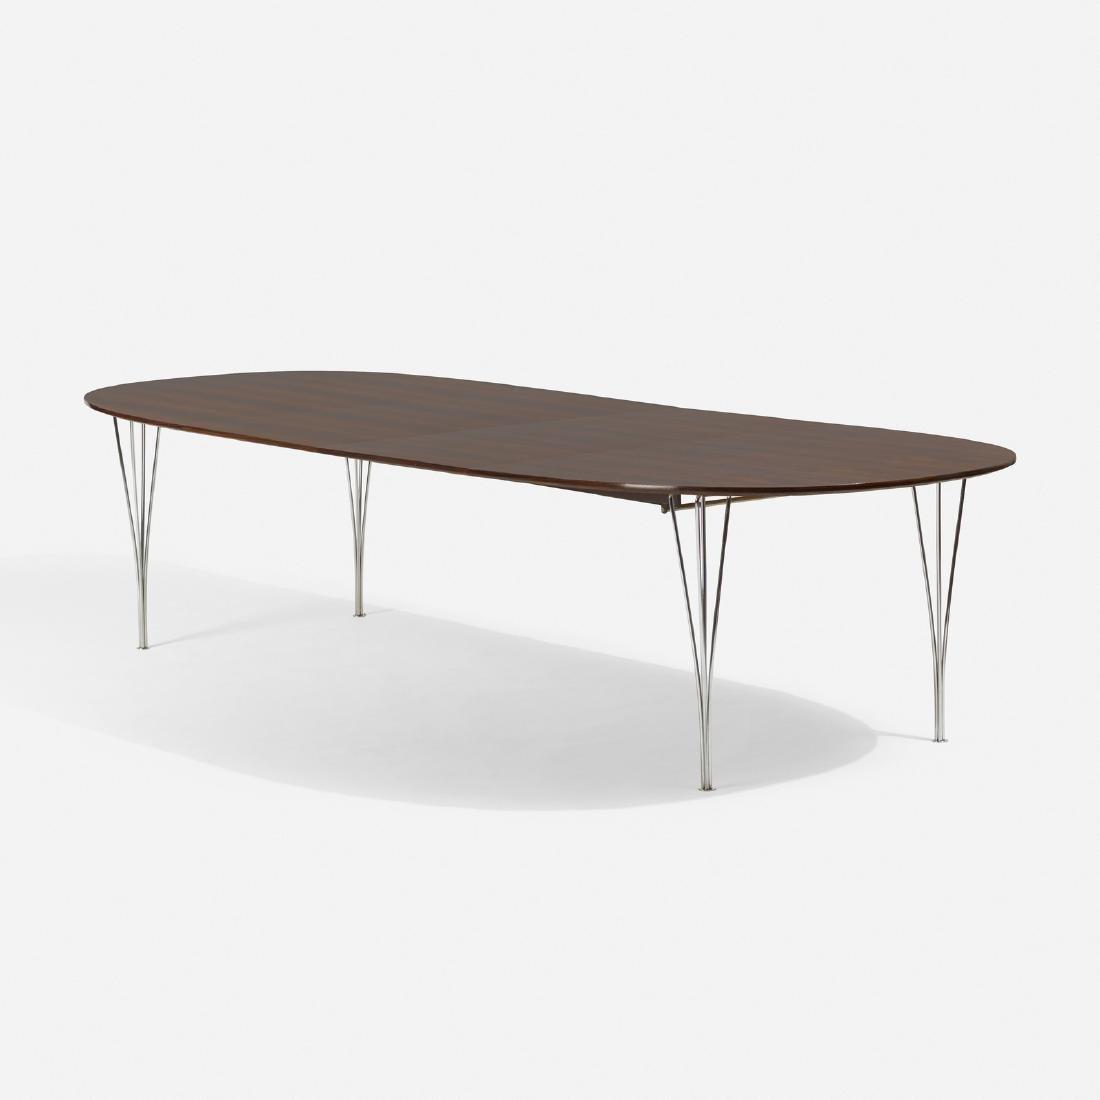 Arne Jacobsen, Hein & Mathsson, Ellipse dining table